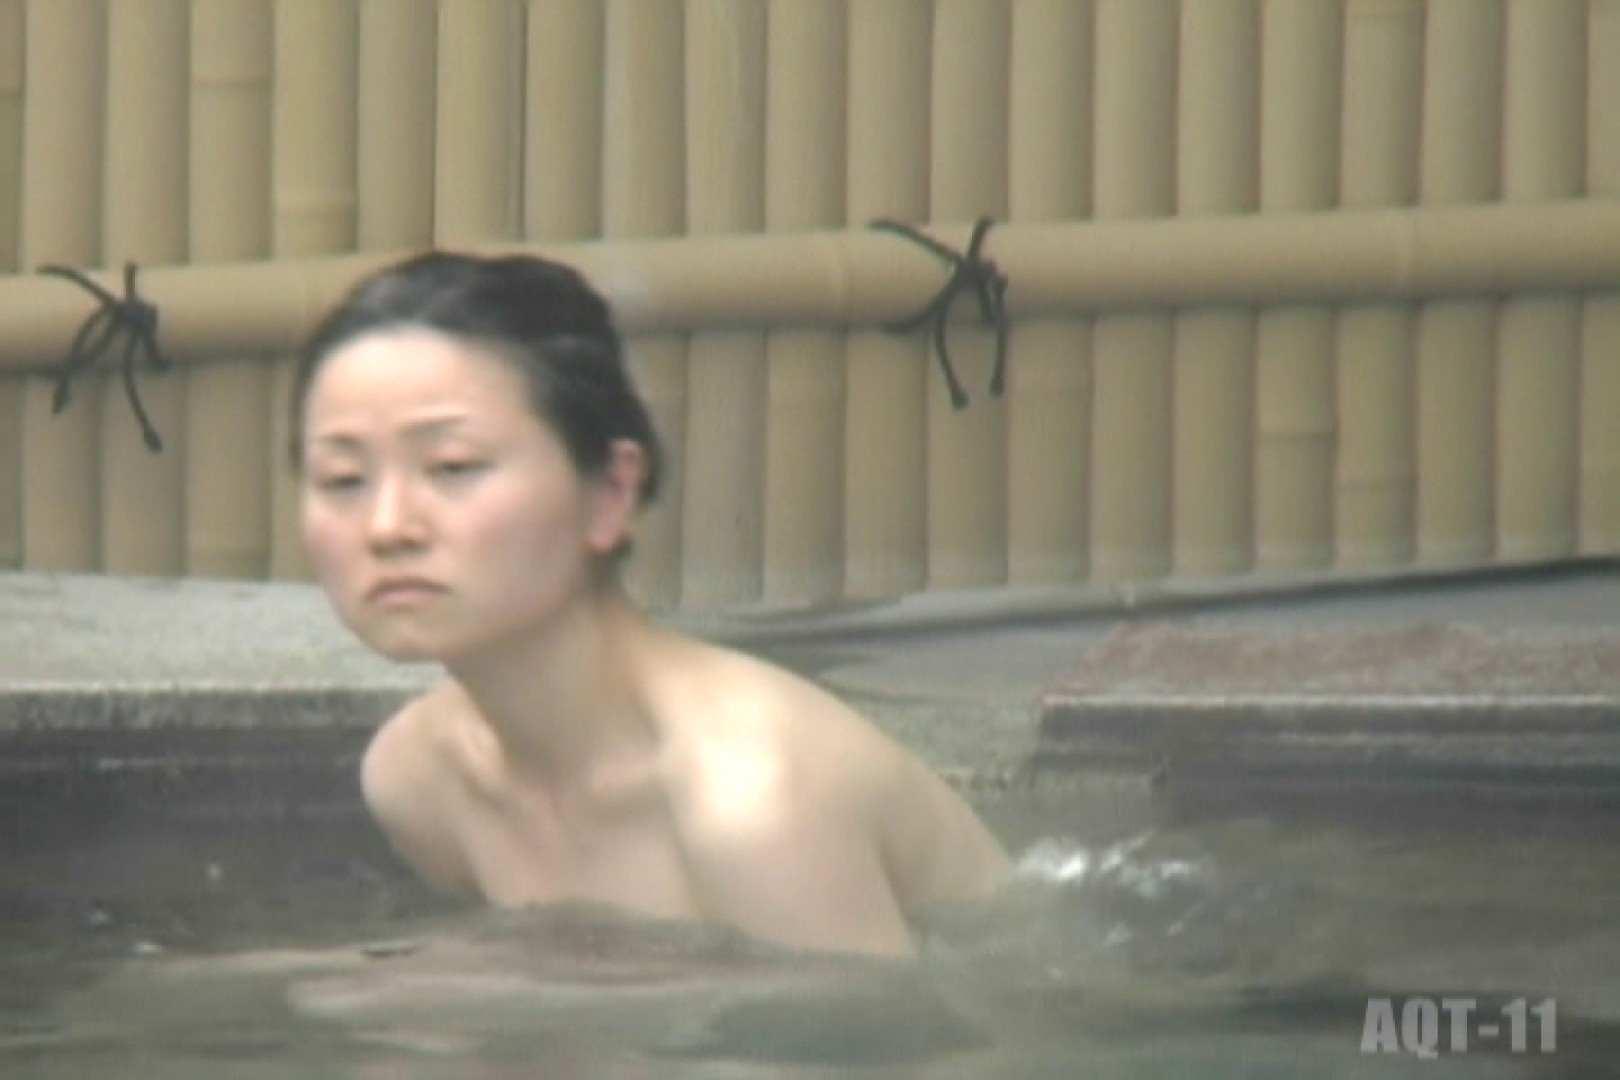 Aquaな露天風呂Vol.802 OLエロ画像 盗撮セックス無修正動画無料 57PICs 56